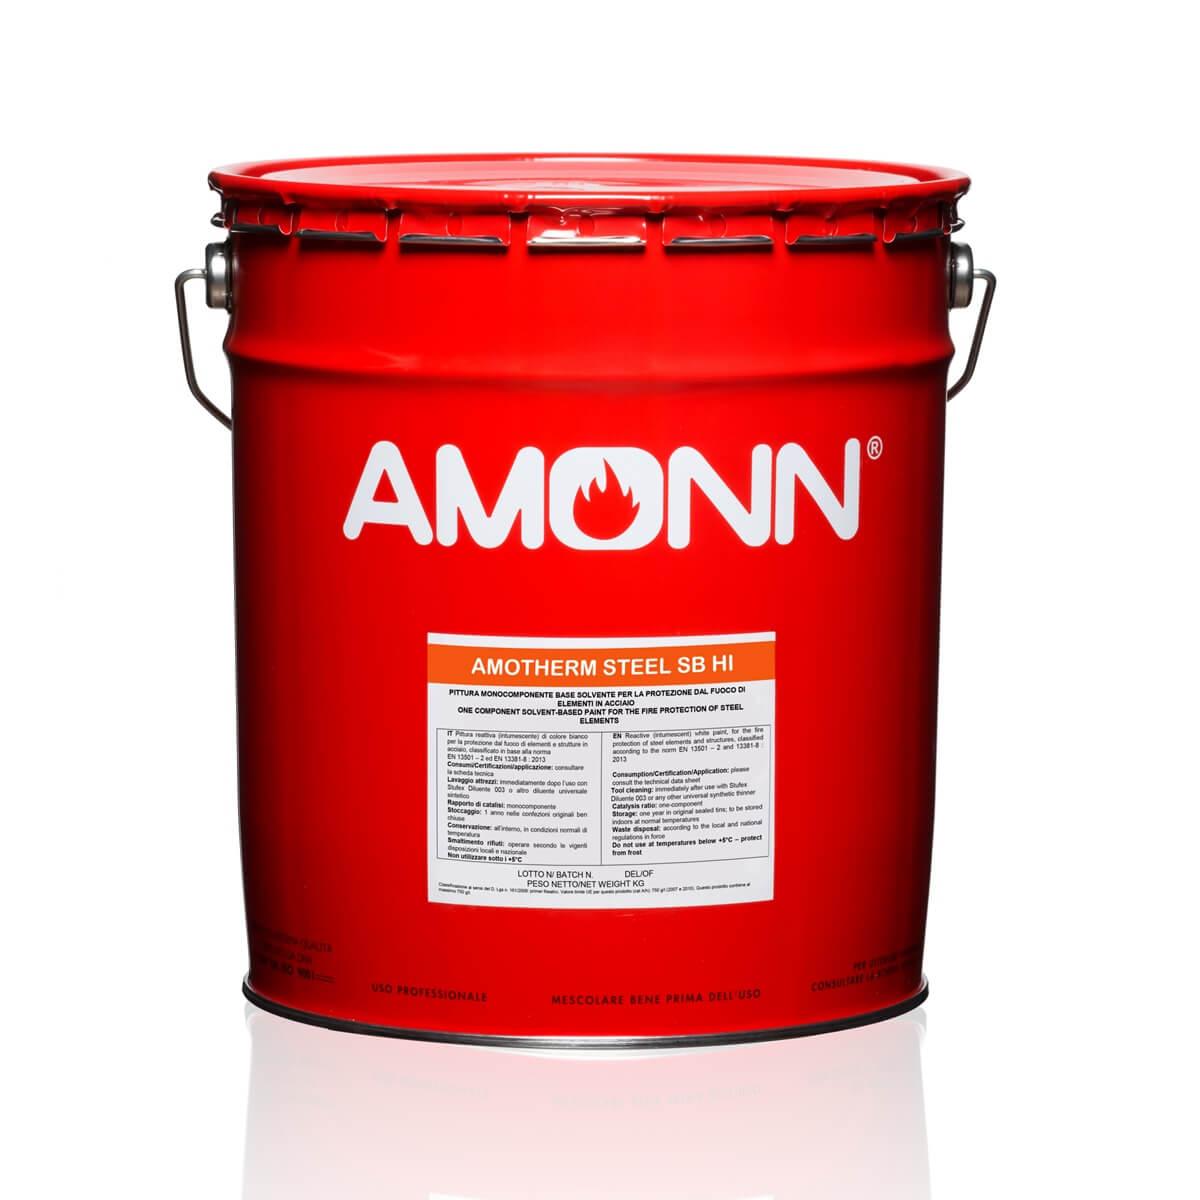 Amotherm - Amotherm Steel SB HI